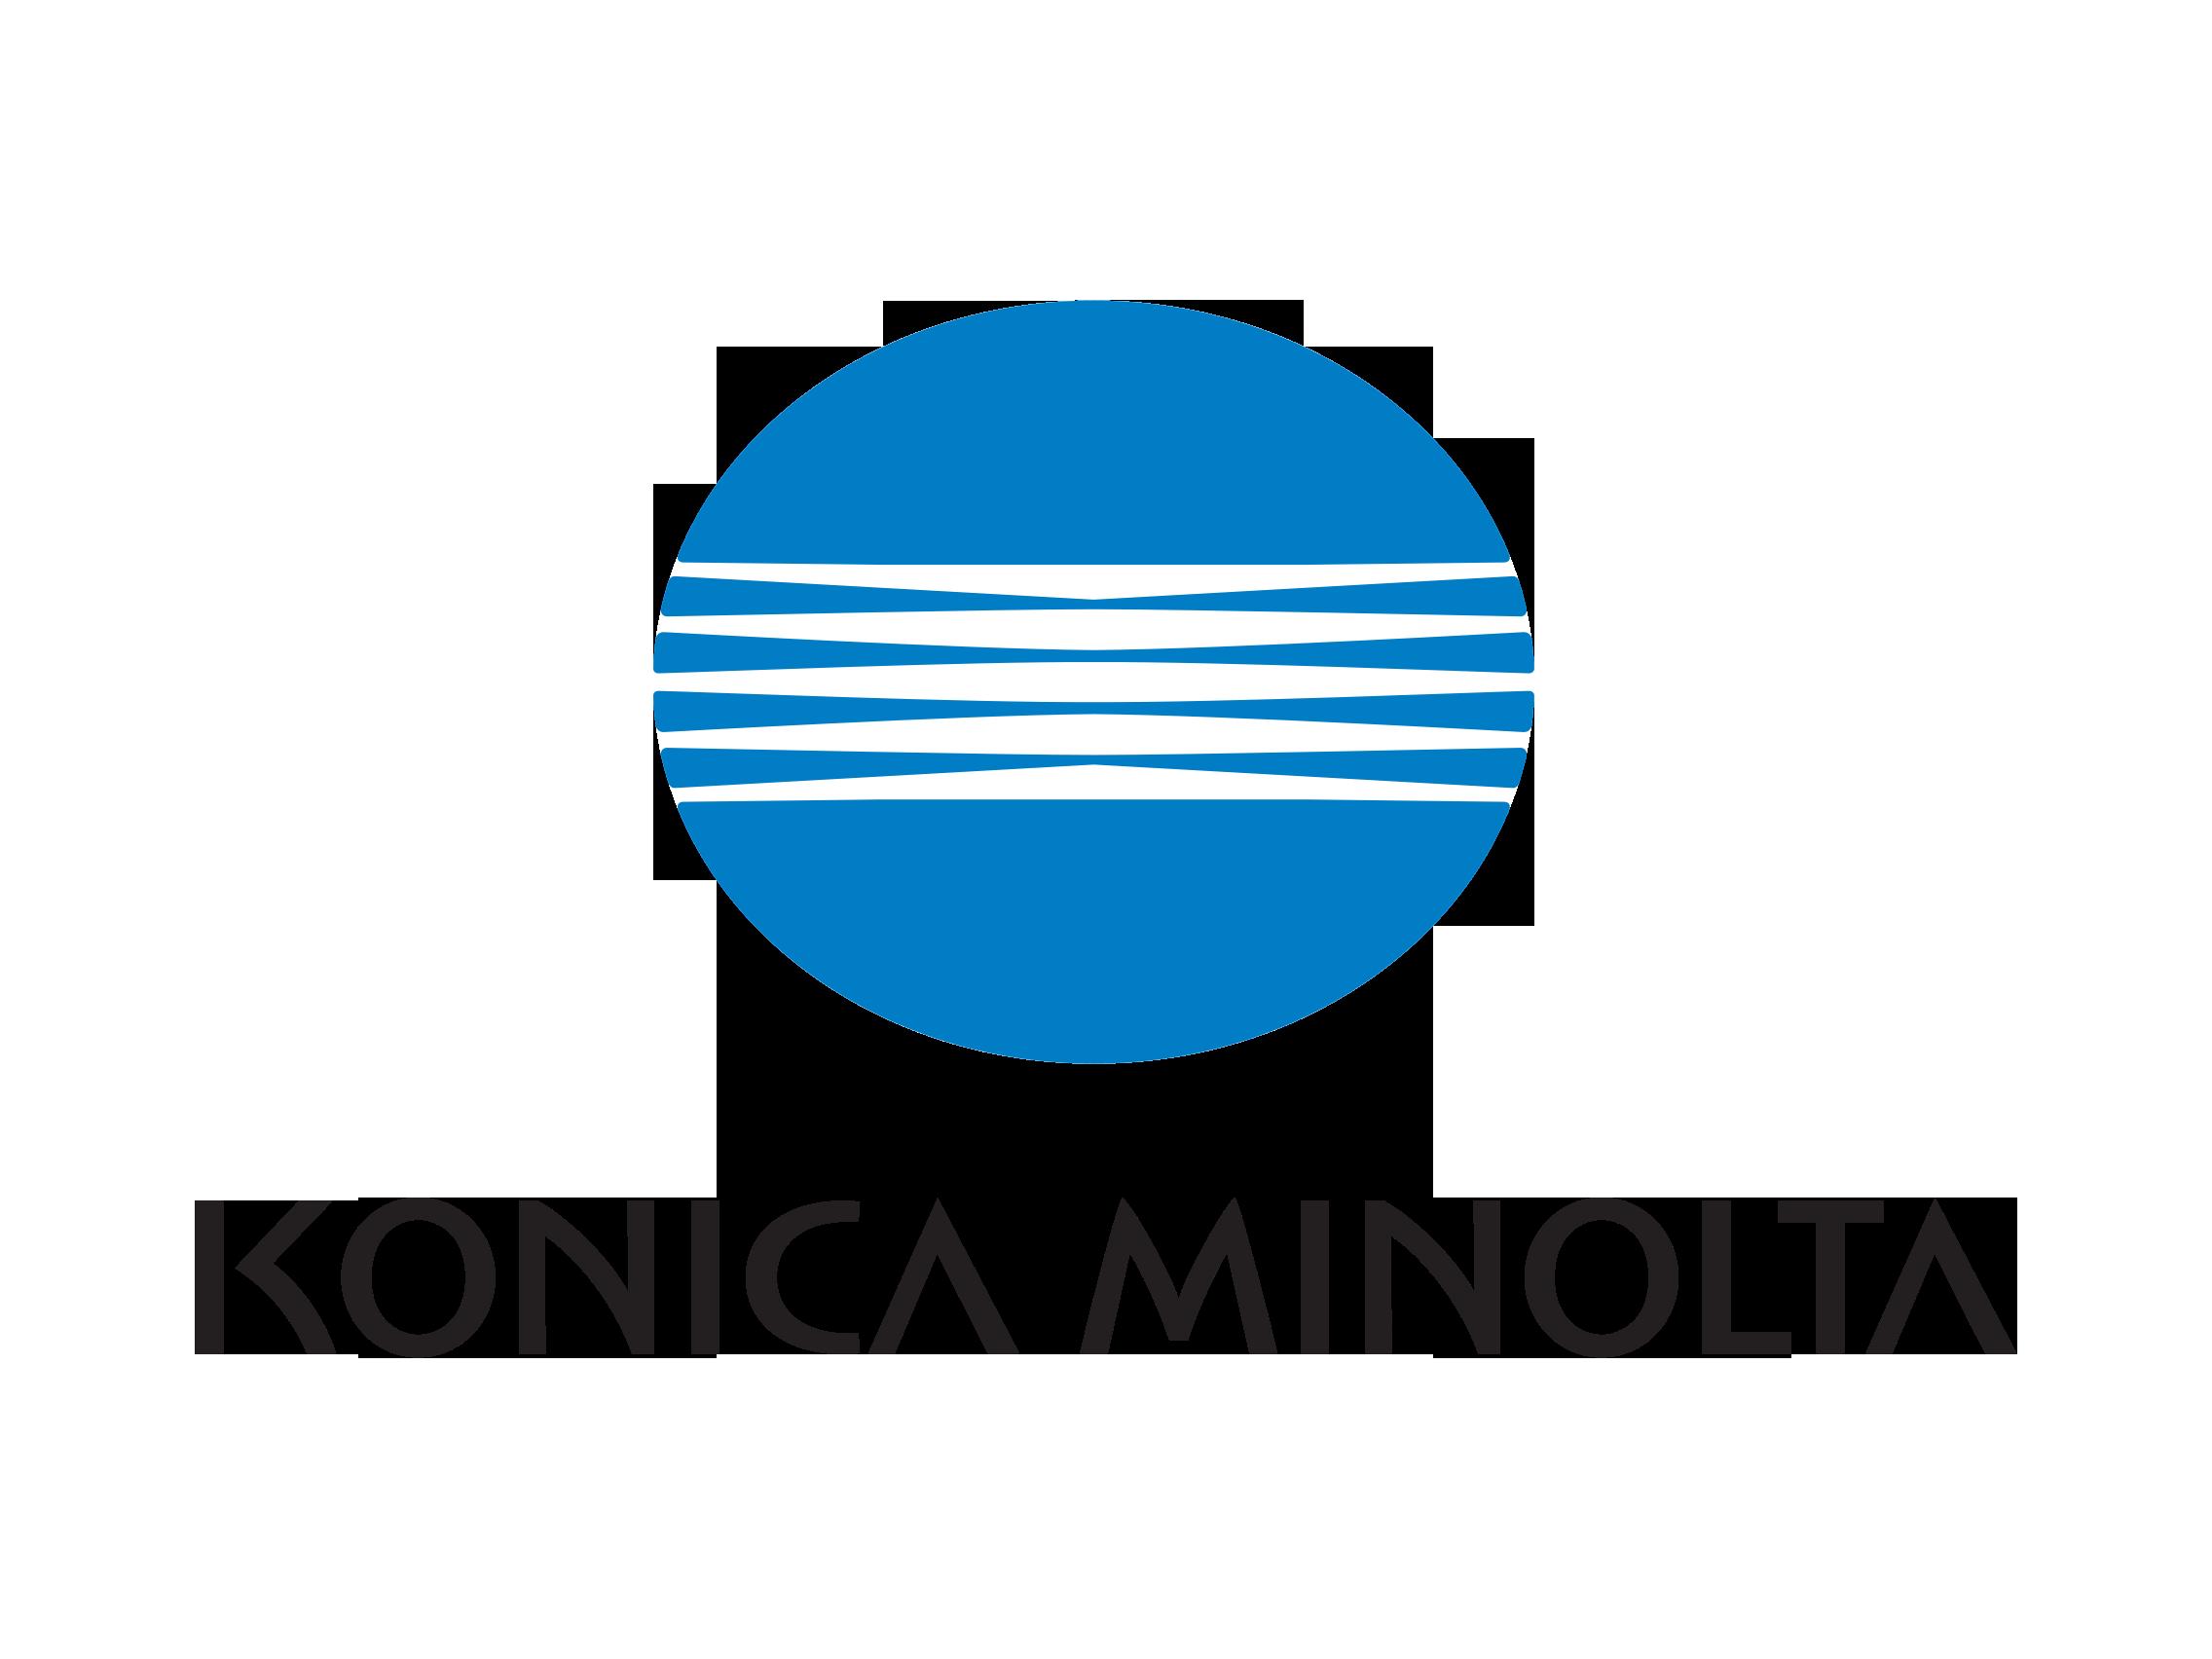 Konica-Minolta-logo-plain.png